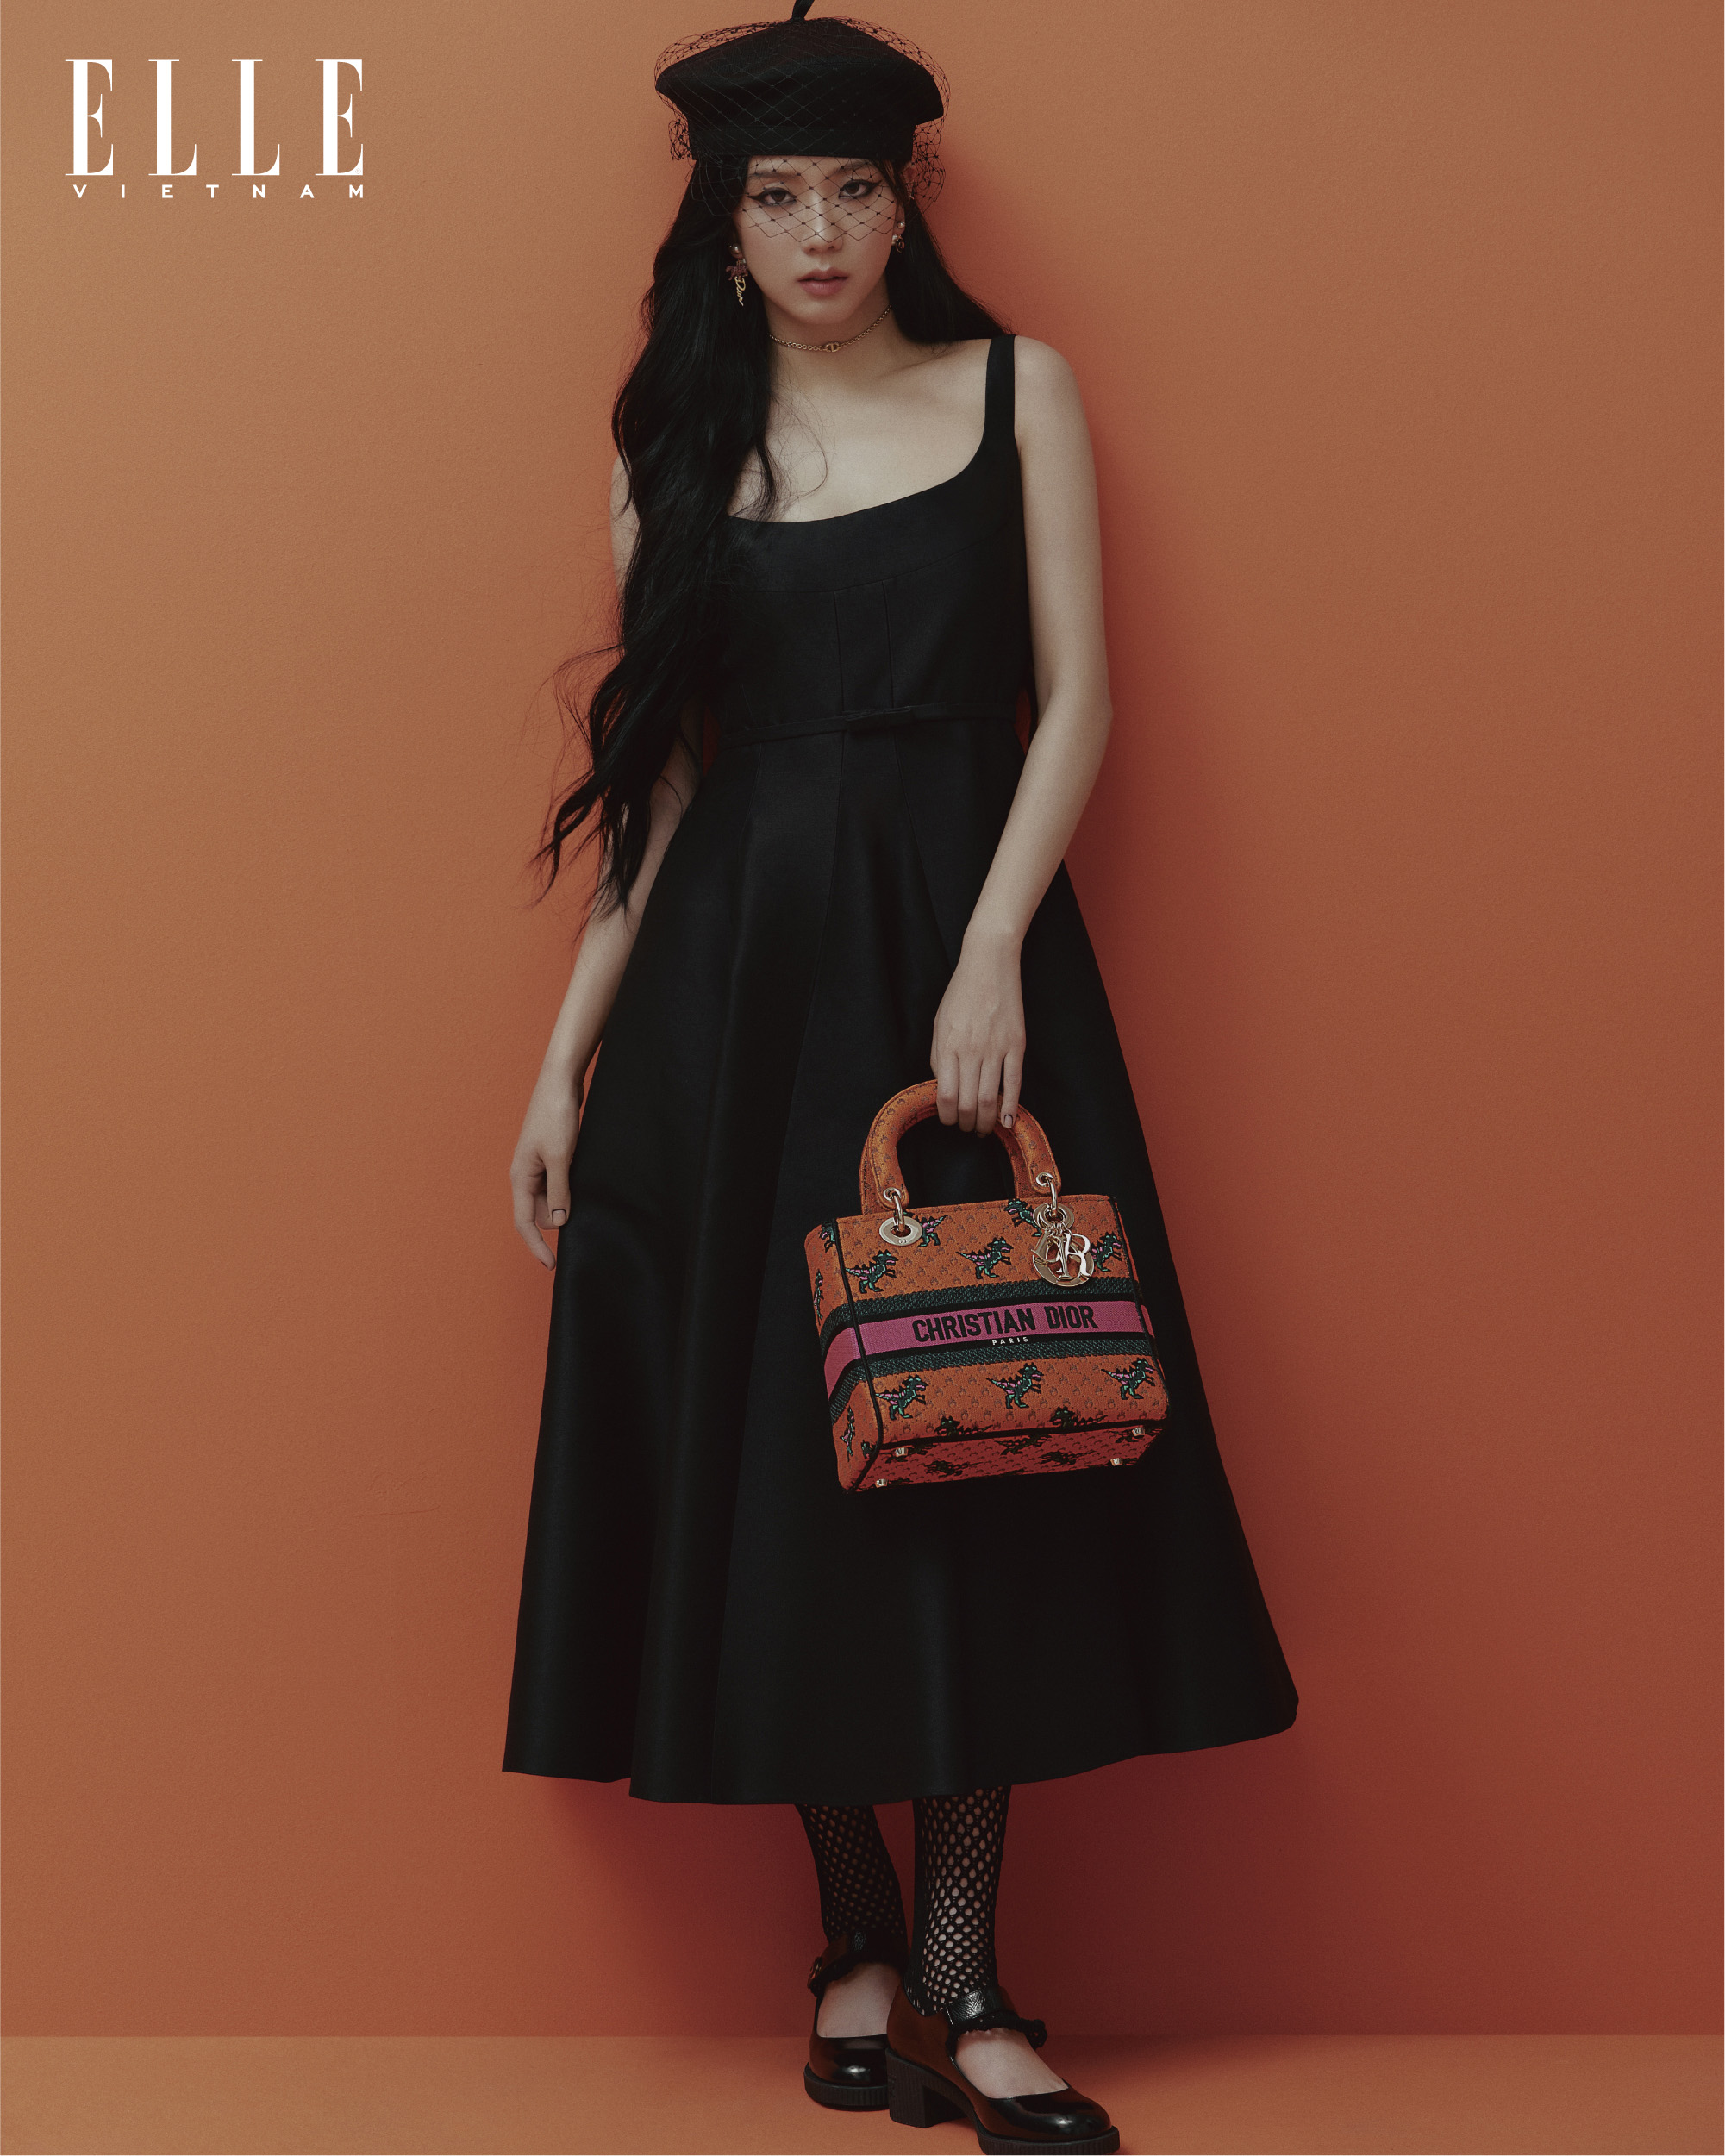 jisoo blackpink mặc váy đen